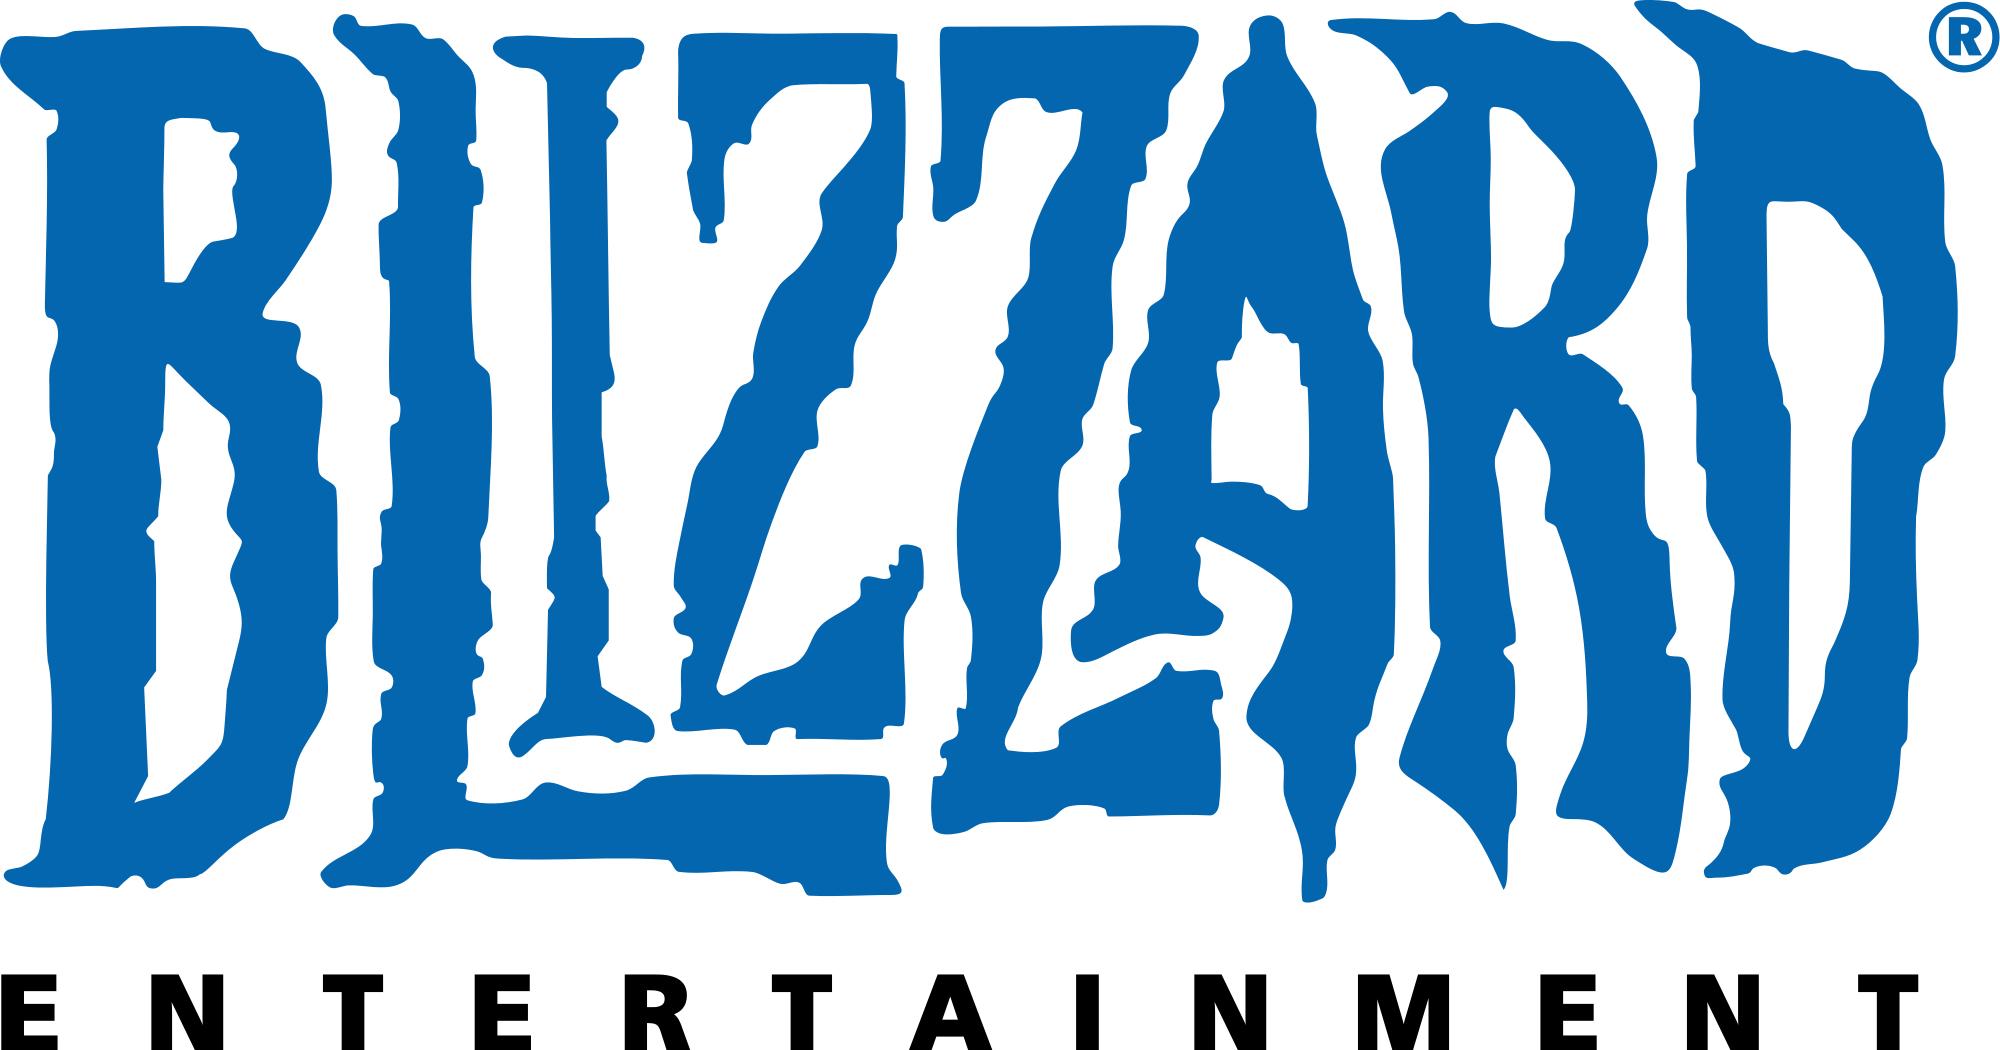 Black Friday - Blizzard - Battle.net